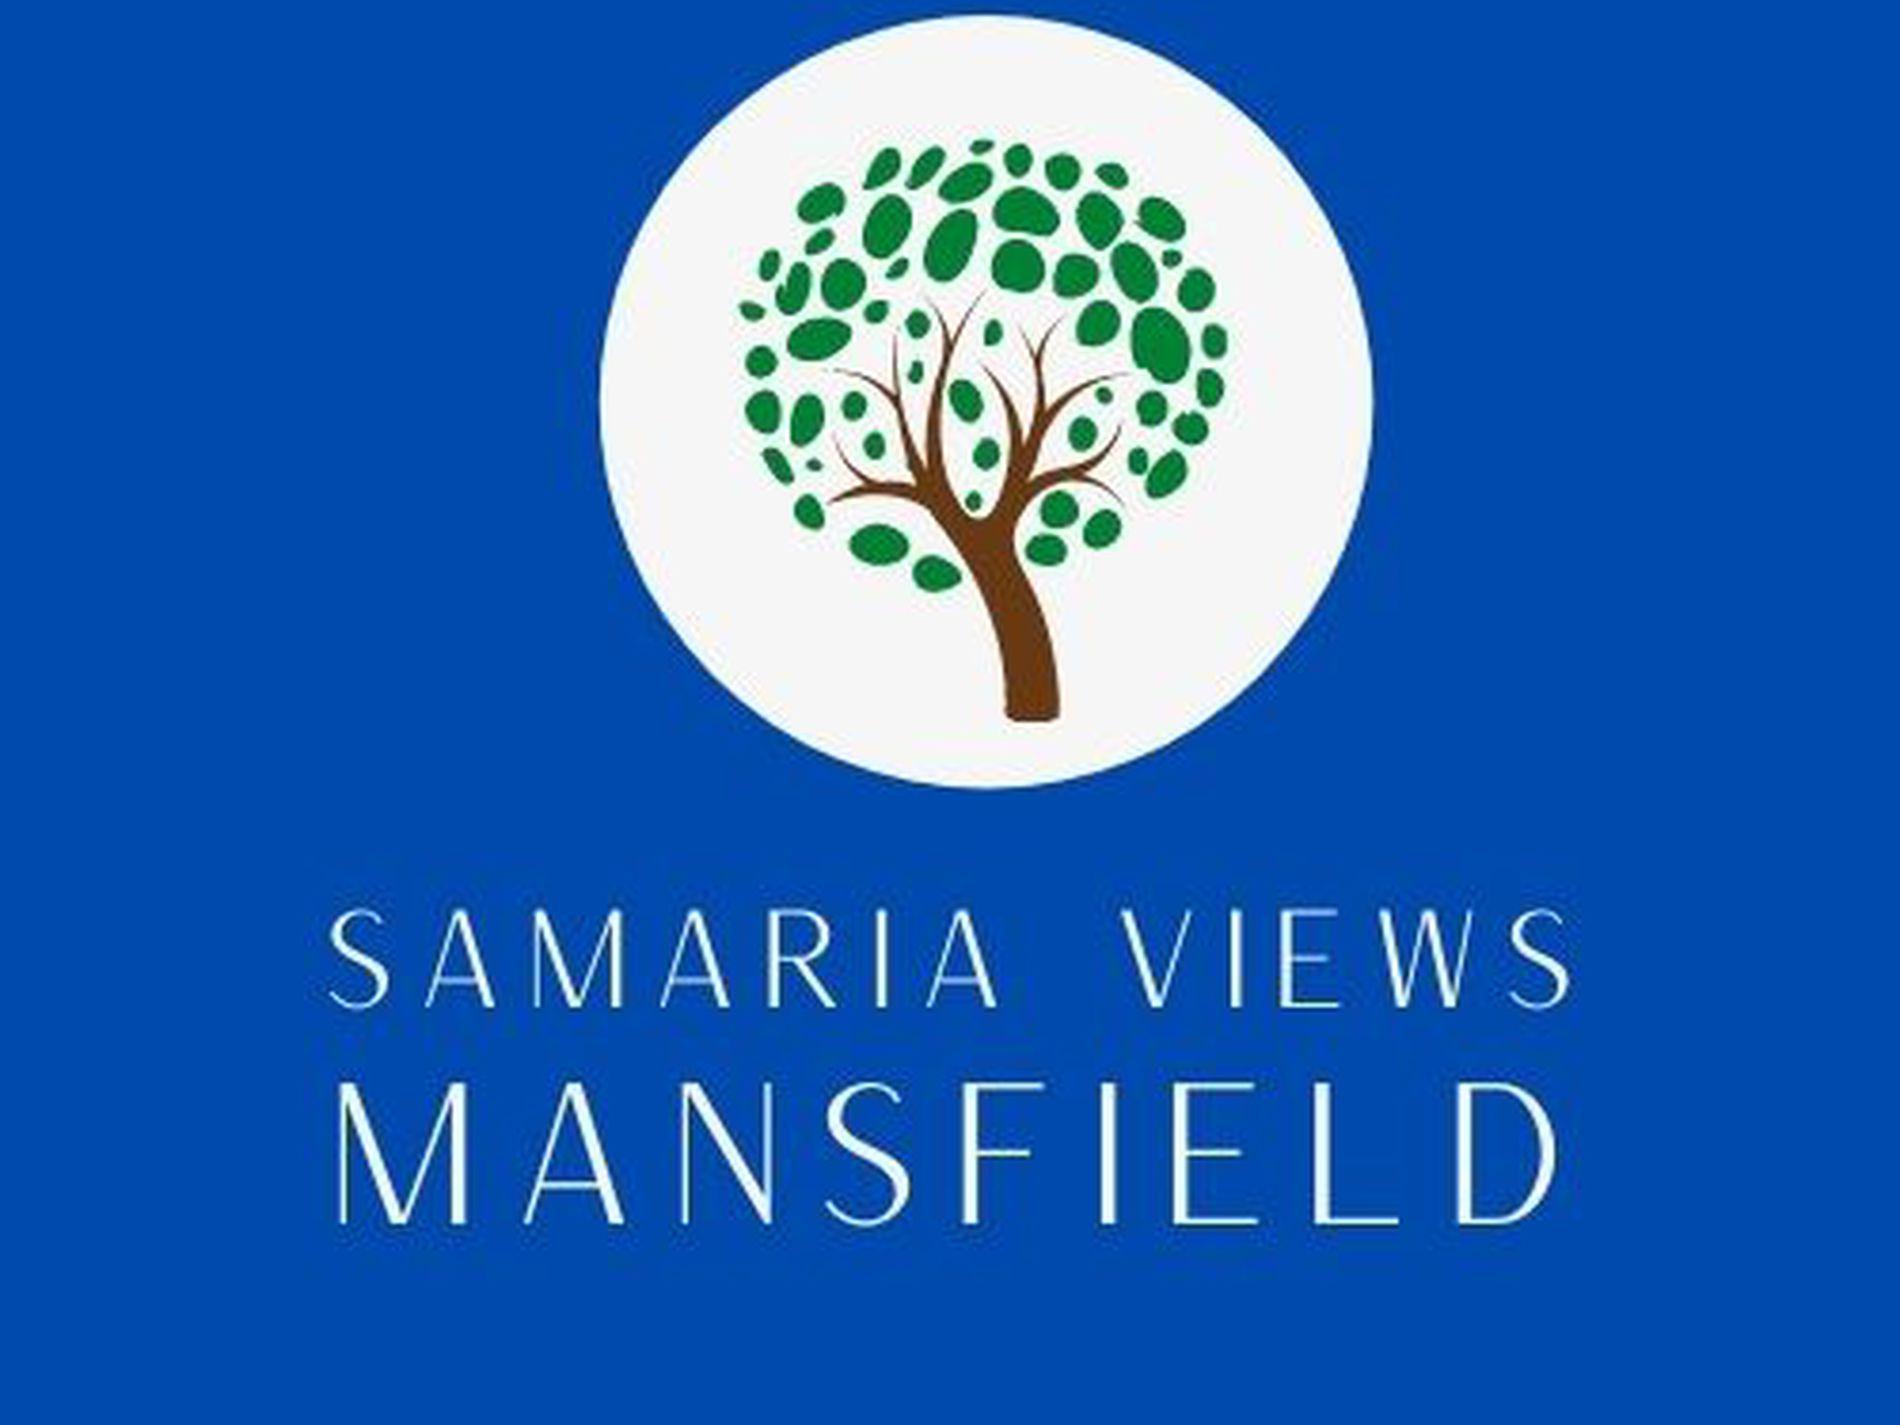 Lot 99, Samaria Views, Mansfield